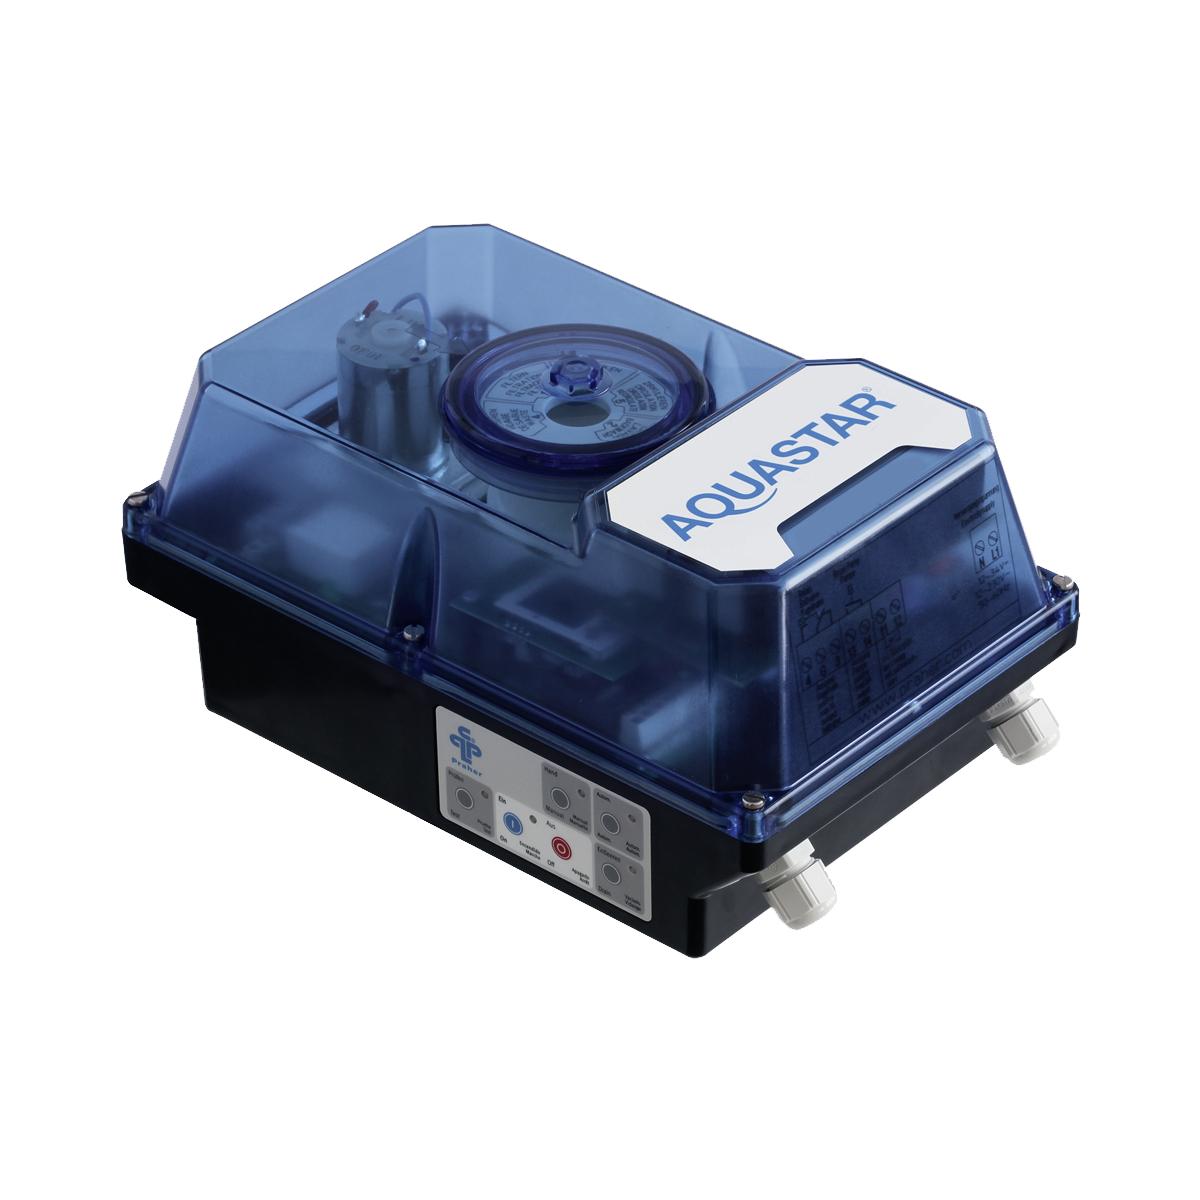 "AquaStar Comfort 6501-24 für Ocean V6 ND 1 1/2"" + 2"" 24V AC/DC, Zeit+Pumpe-Uhr + Druck-Schalter AquaStar Comfort 6501-24 für Ocean V6 ND 1 1/2"" + 2"" 24V AC/DC, Zeit+Pumpe-Uhr + Druck-Schalter"